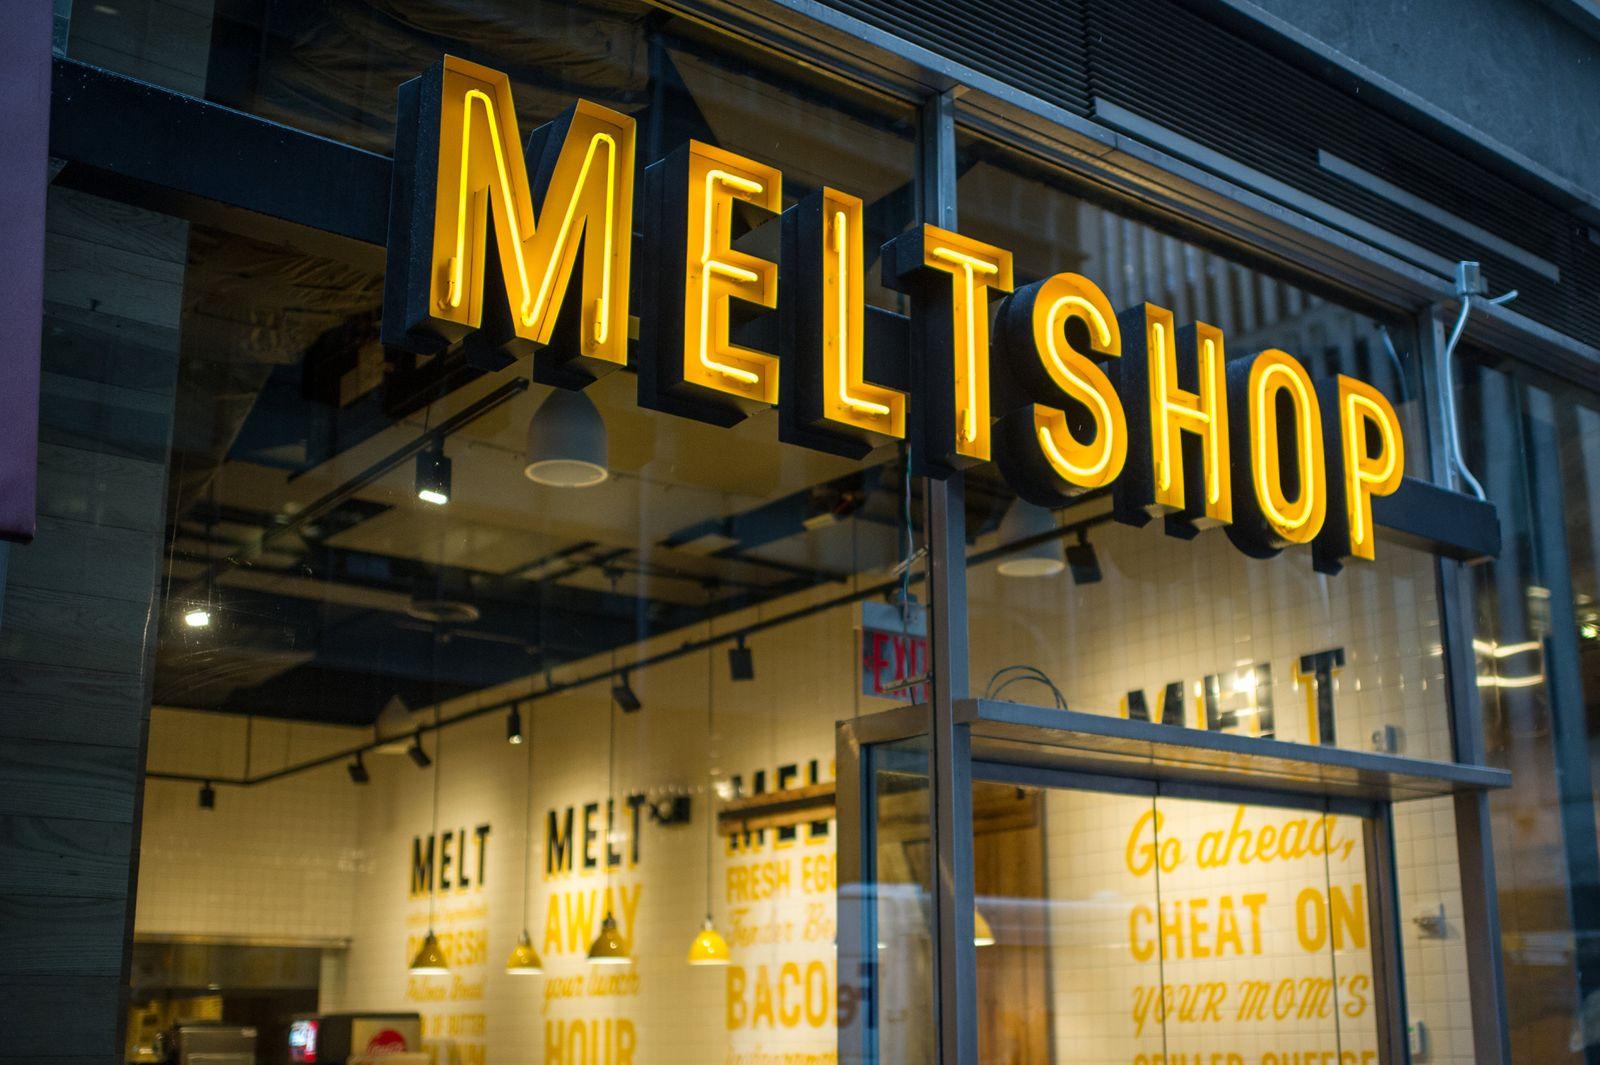 Melt Shop Seeks Multi-Unit Franchisees at Restaurant Finance & Development Conference in Las Vegas, Nov. 13-15